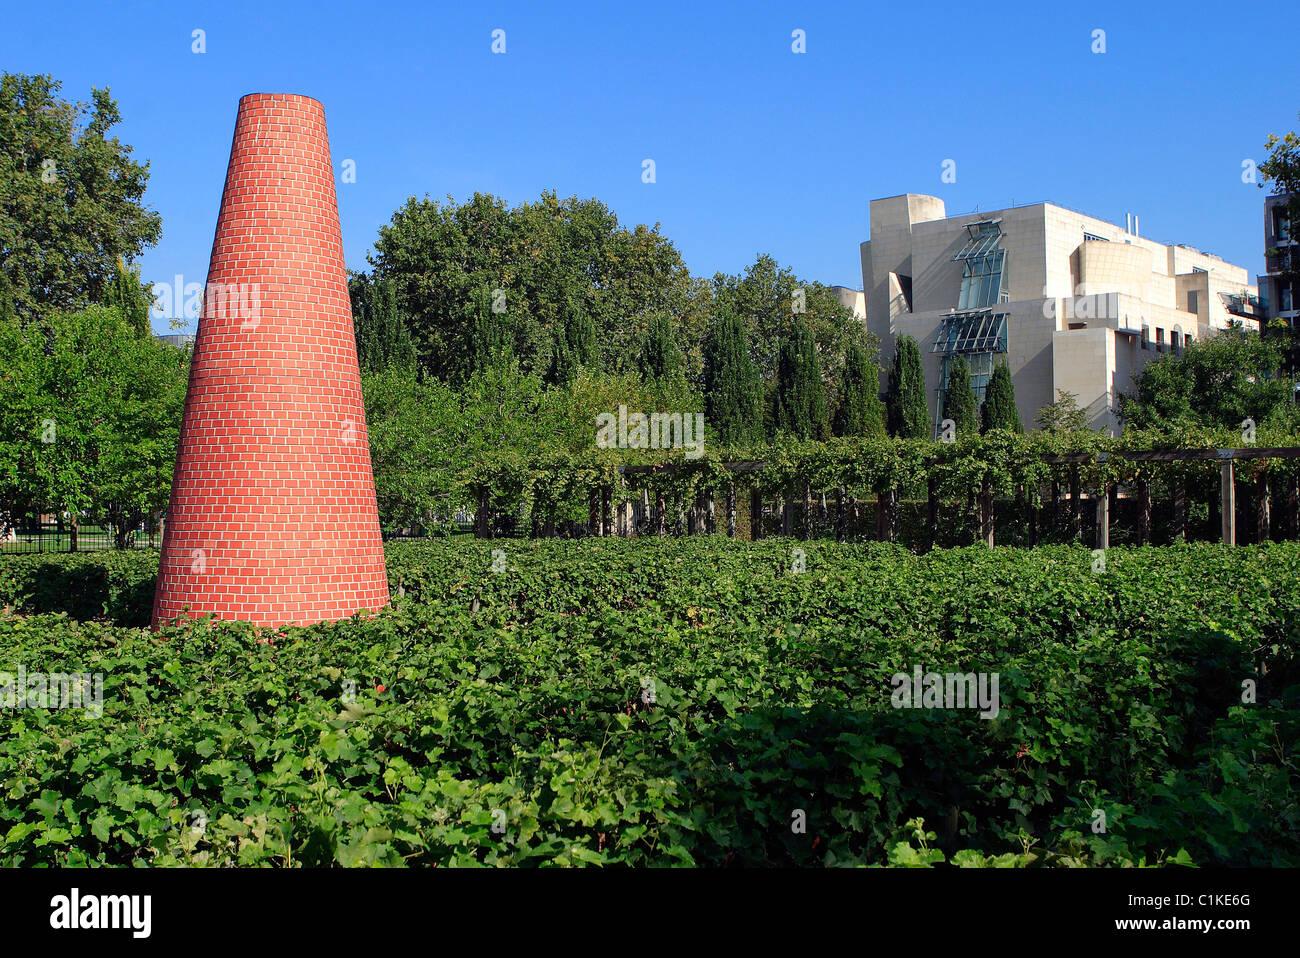 France, Paris, Park of Bercy, vineyard - Stock Image